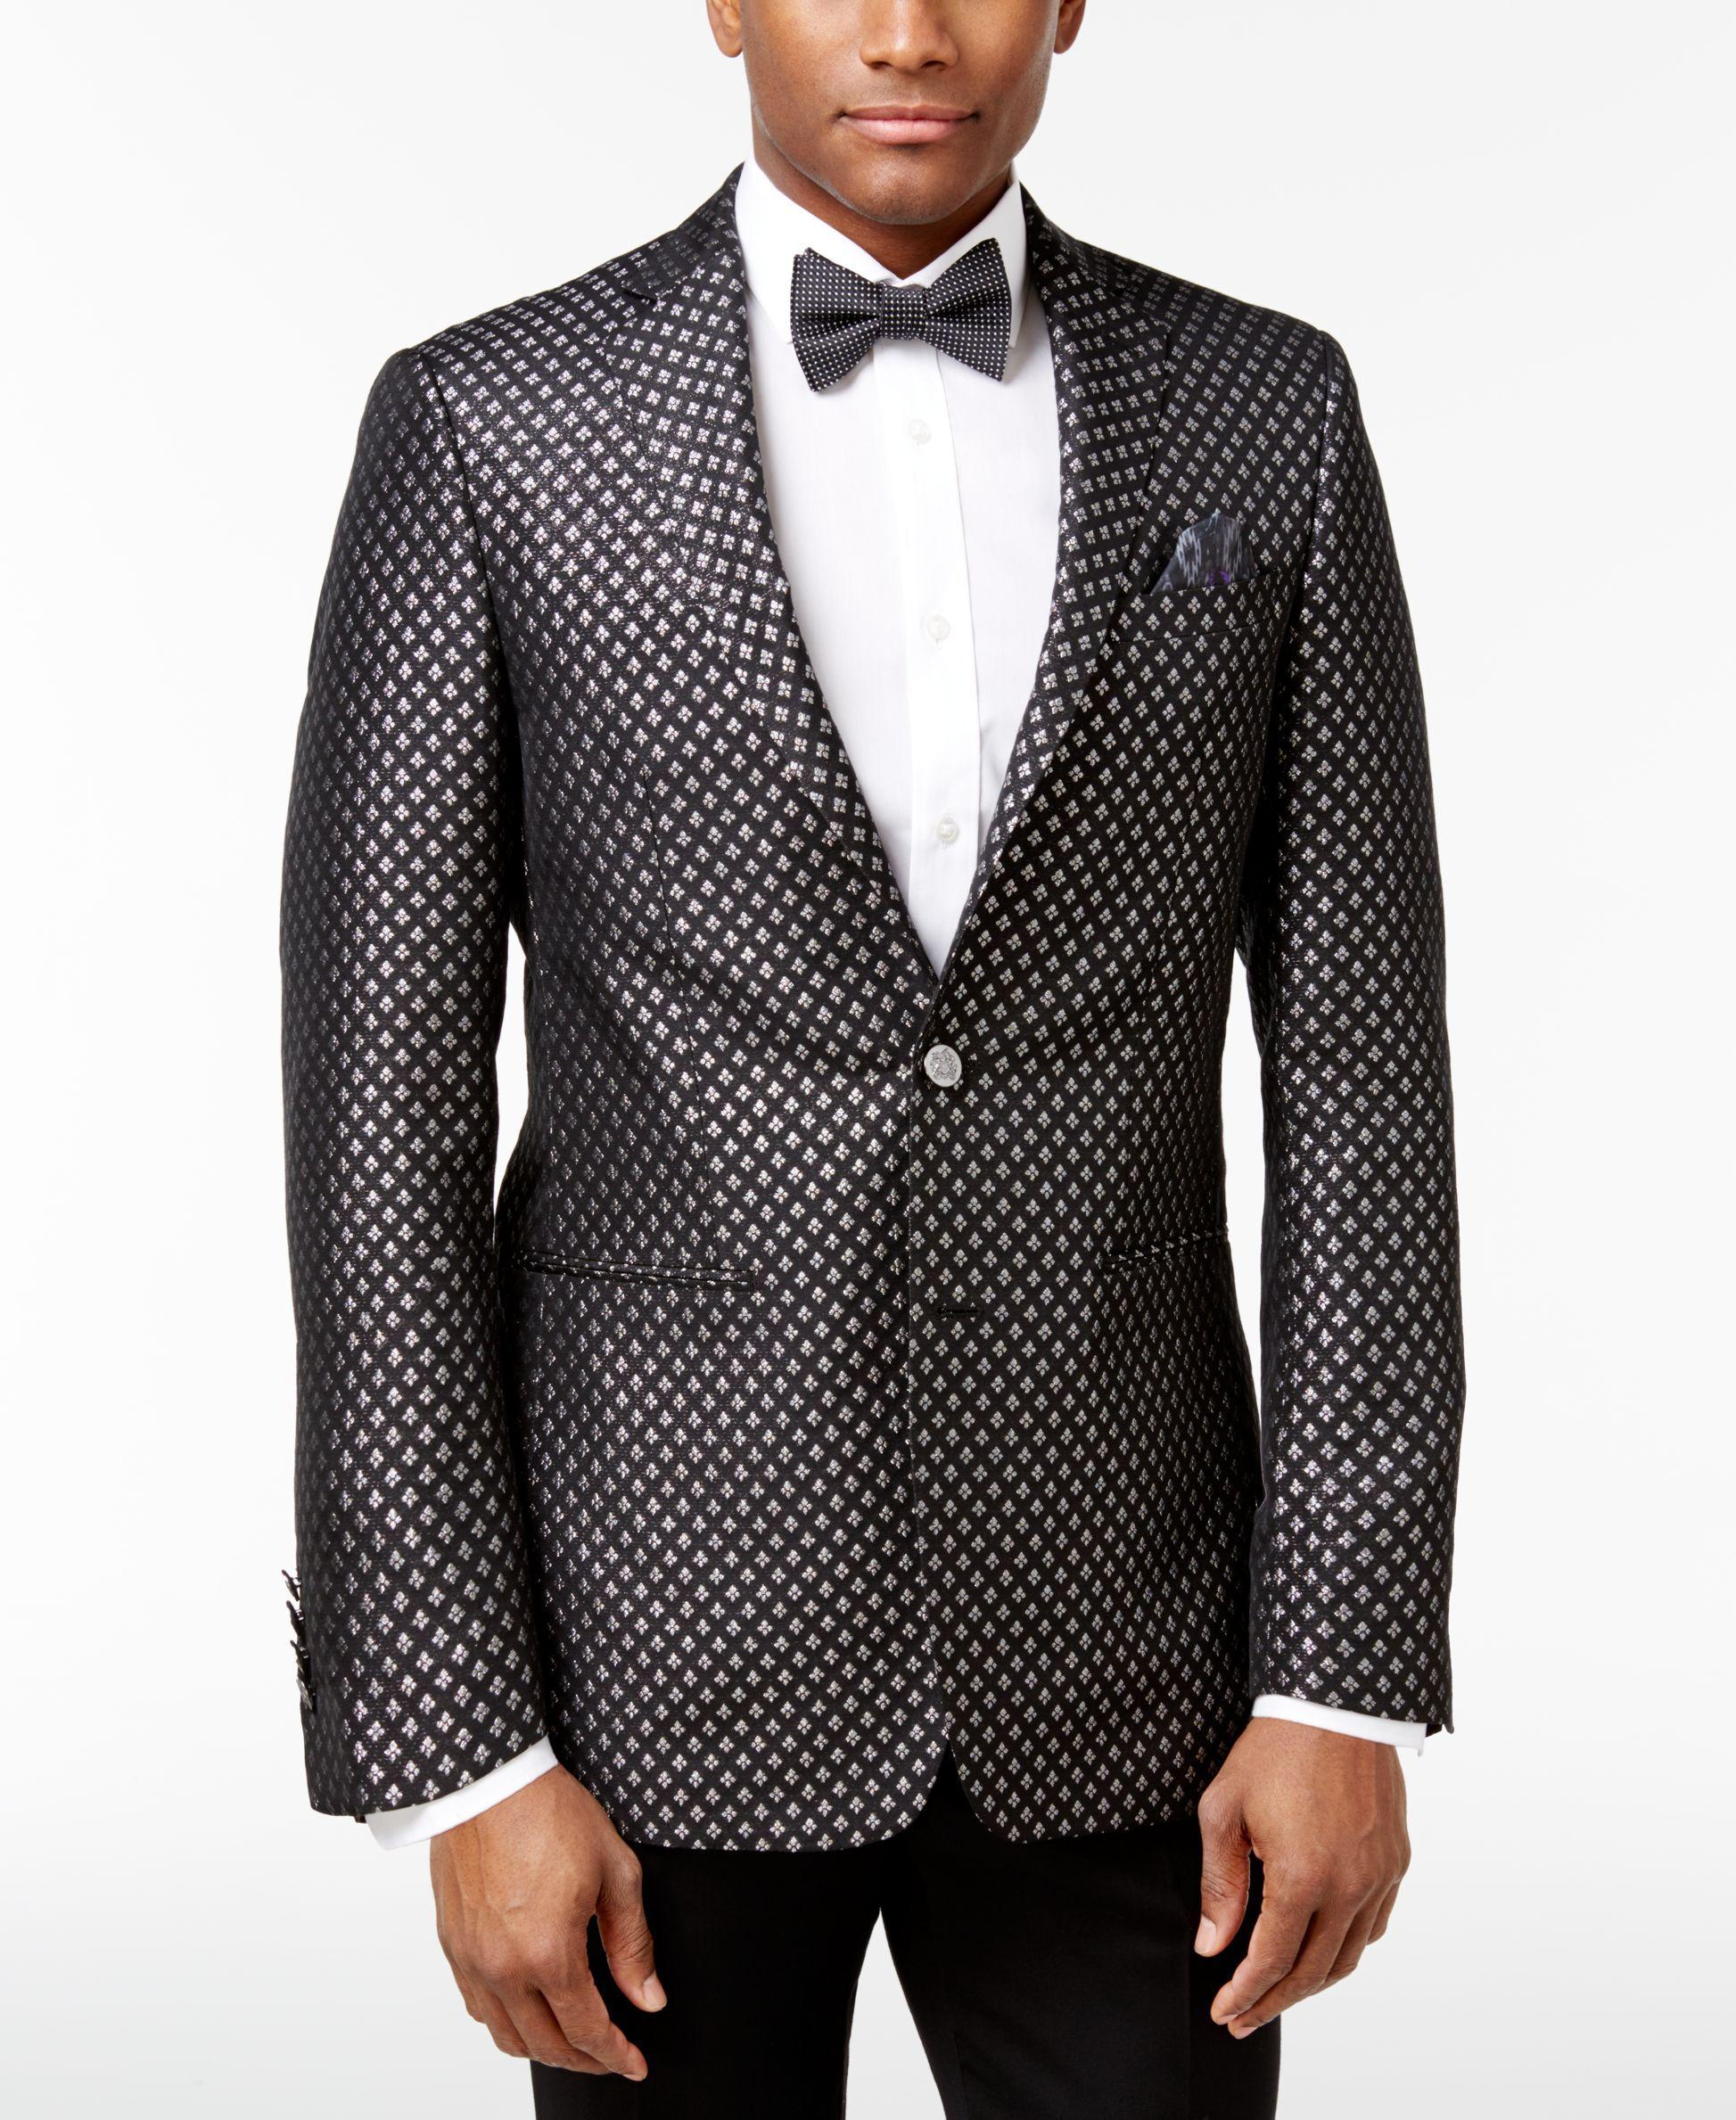 33e19642426 Tallia Men's Slim-Fit Black/Metallic Silver Diamond Dinner Jacket ...